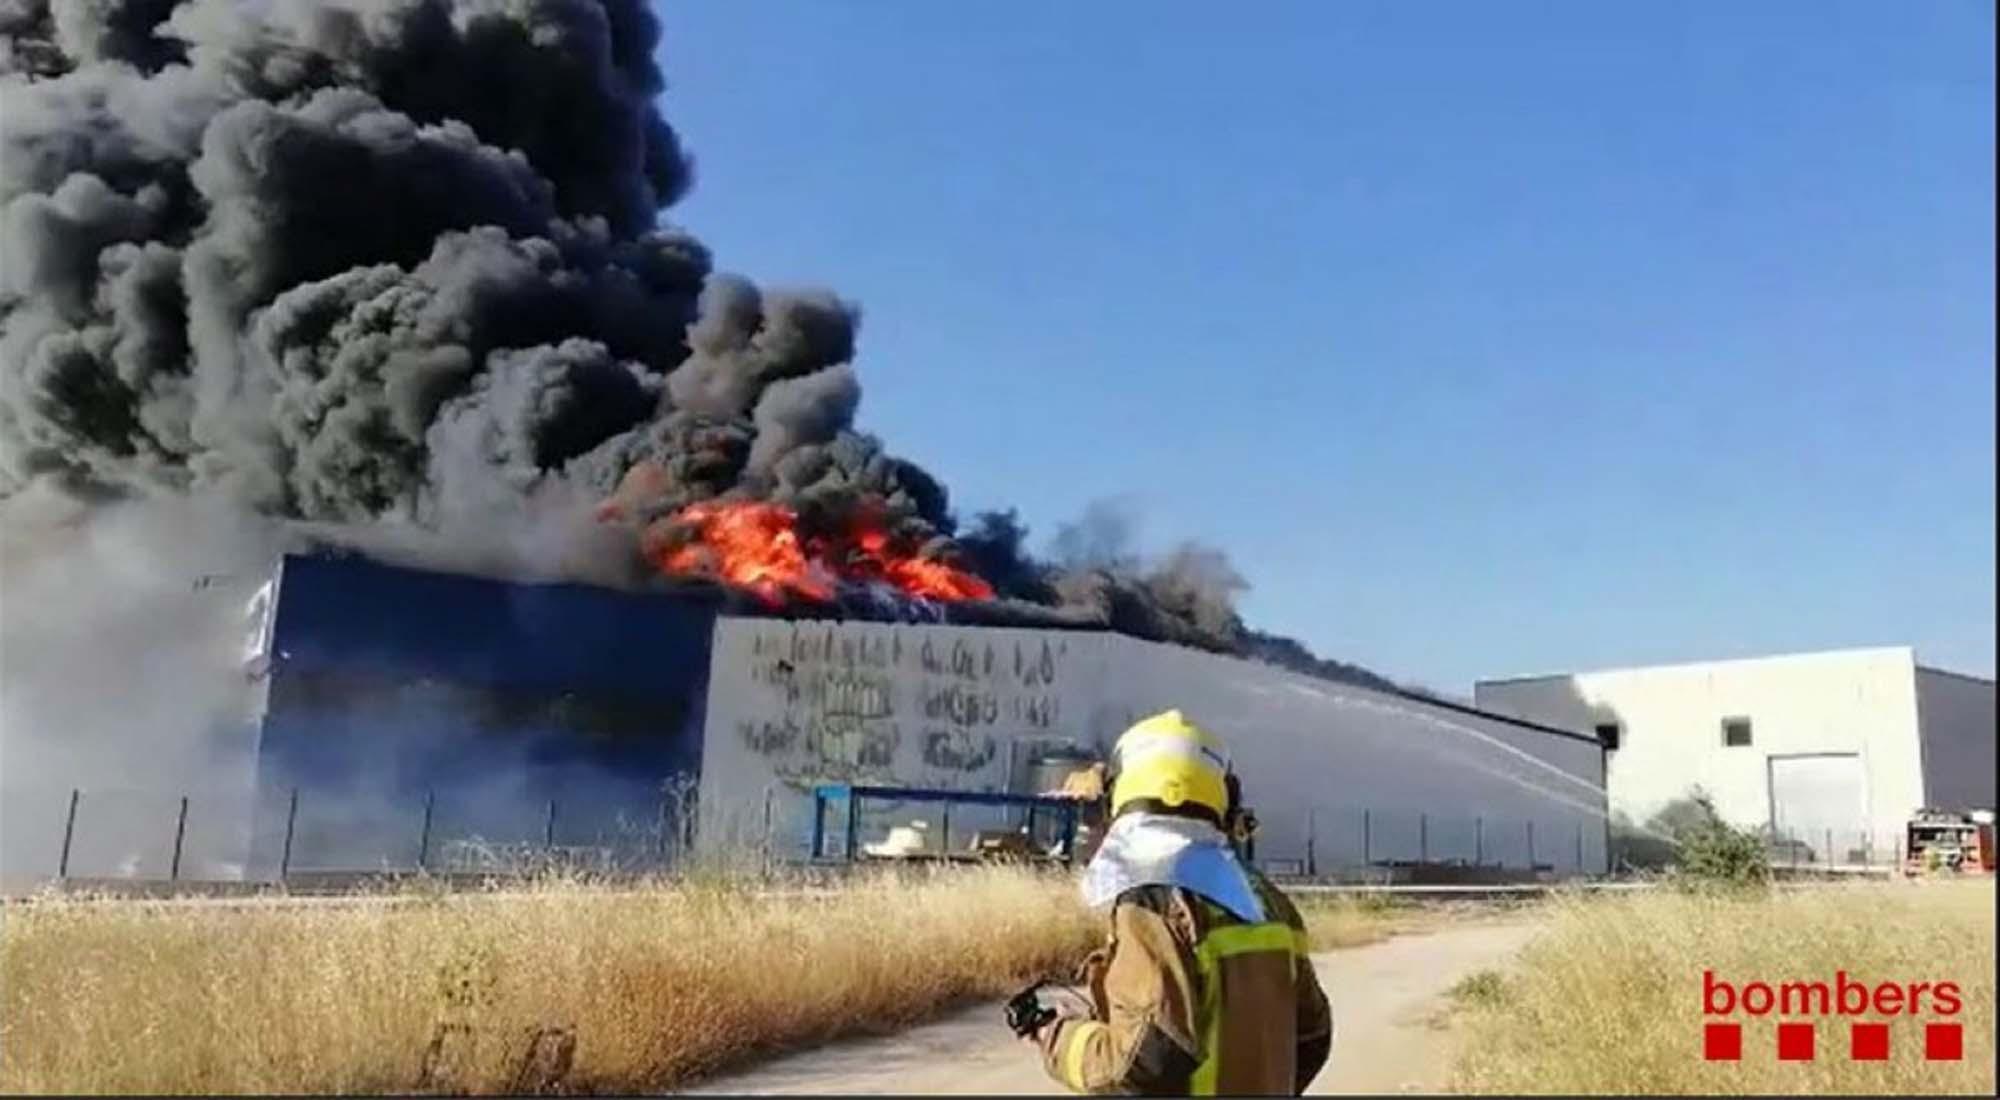 Un virulent incendi crema una fàbrica a Cervera